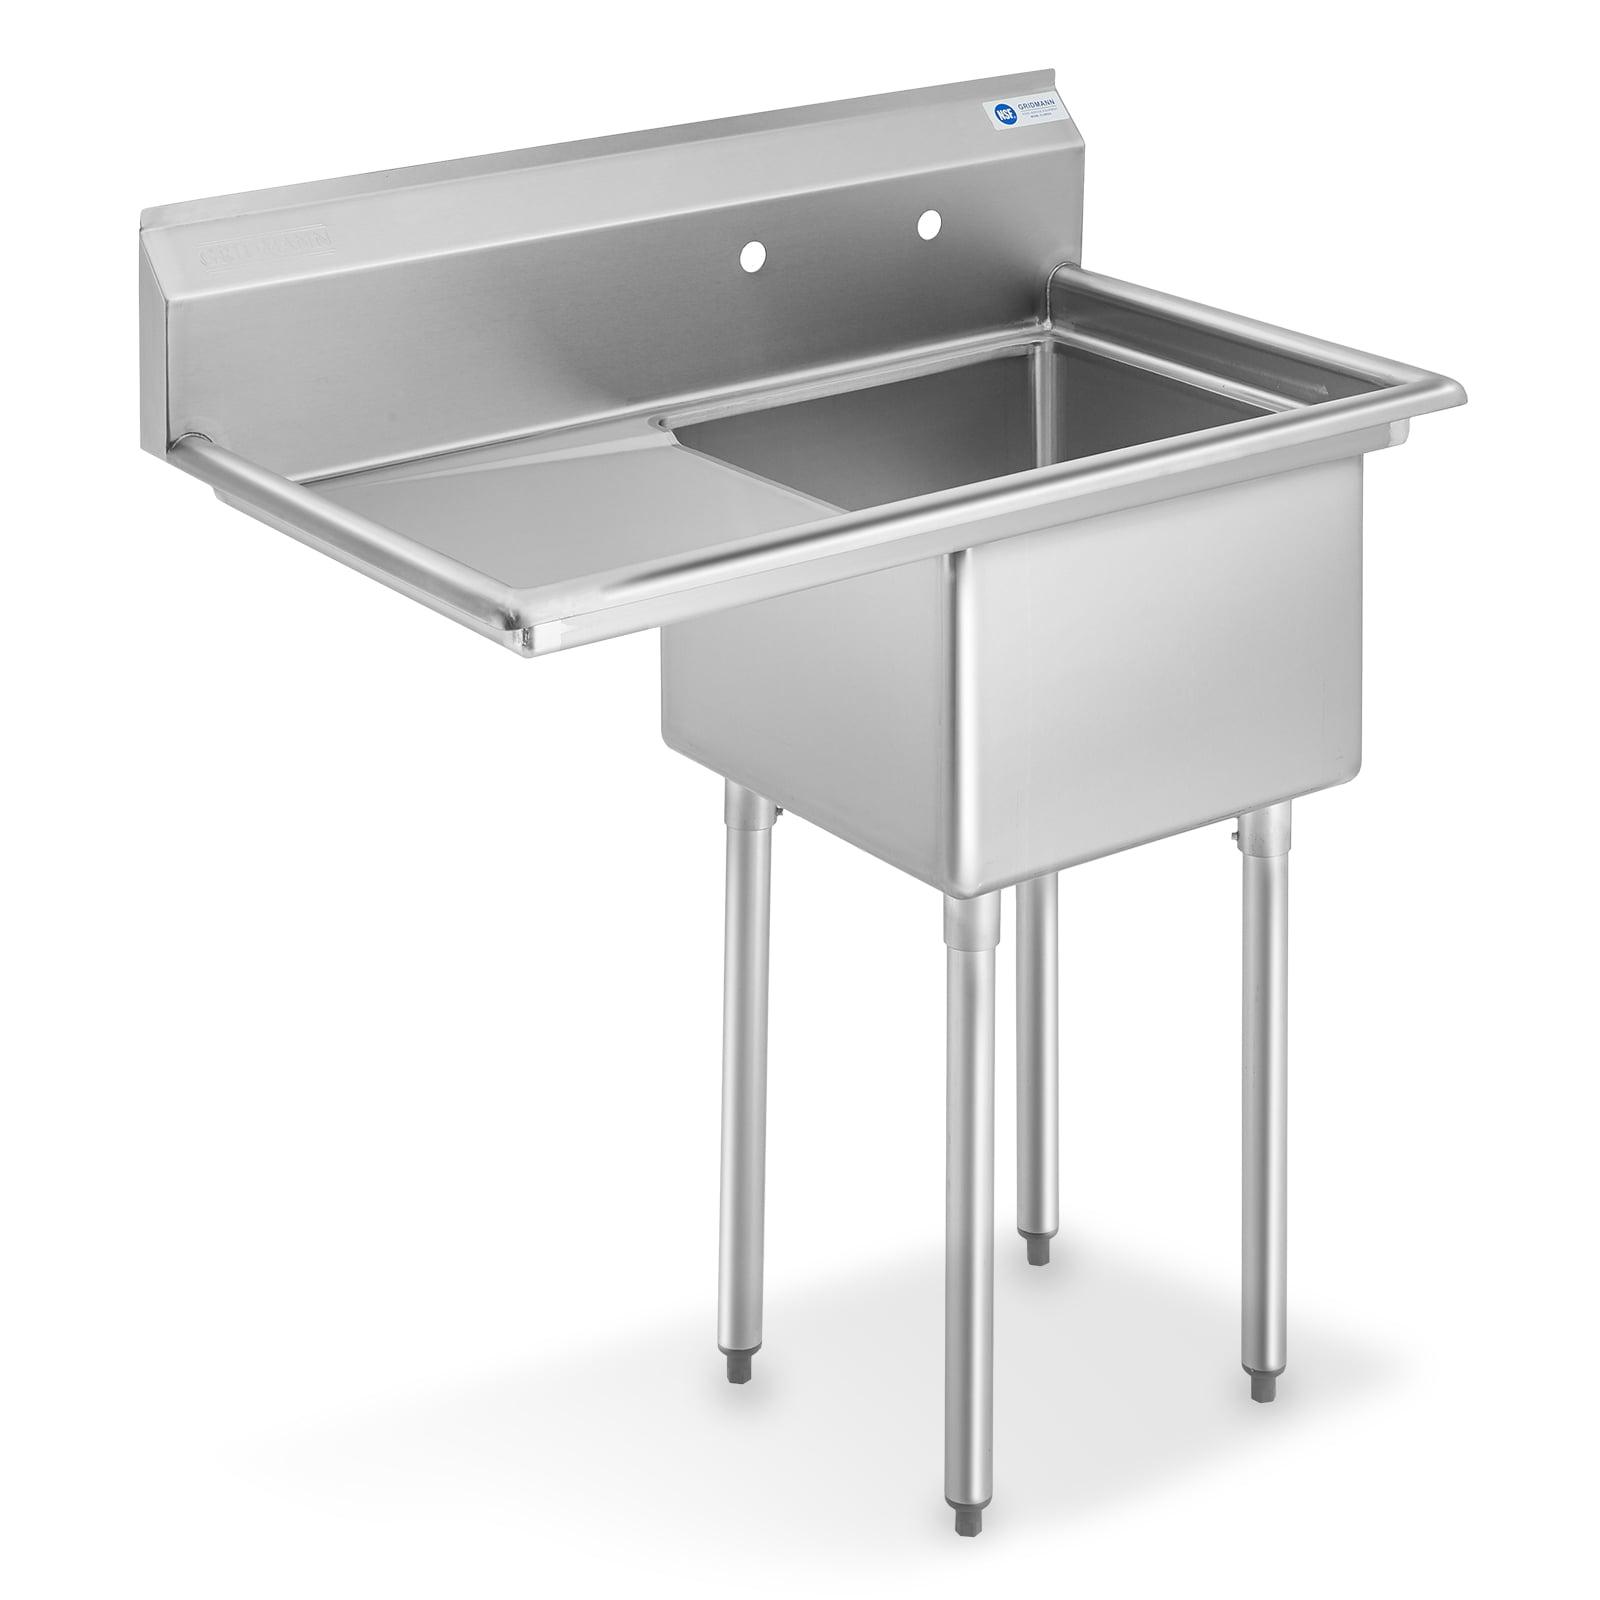 Gridmann Nsf Stainless Steel 18 Single Bowl Commercial Kitchen Sink With Left Drainboard 12 In Deep Walmart Com Walmart Com